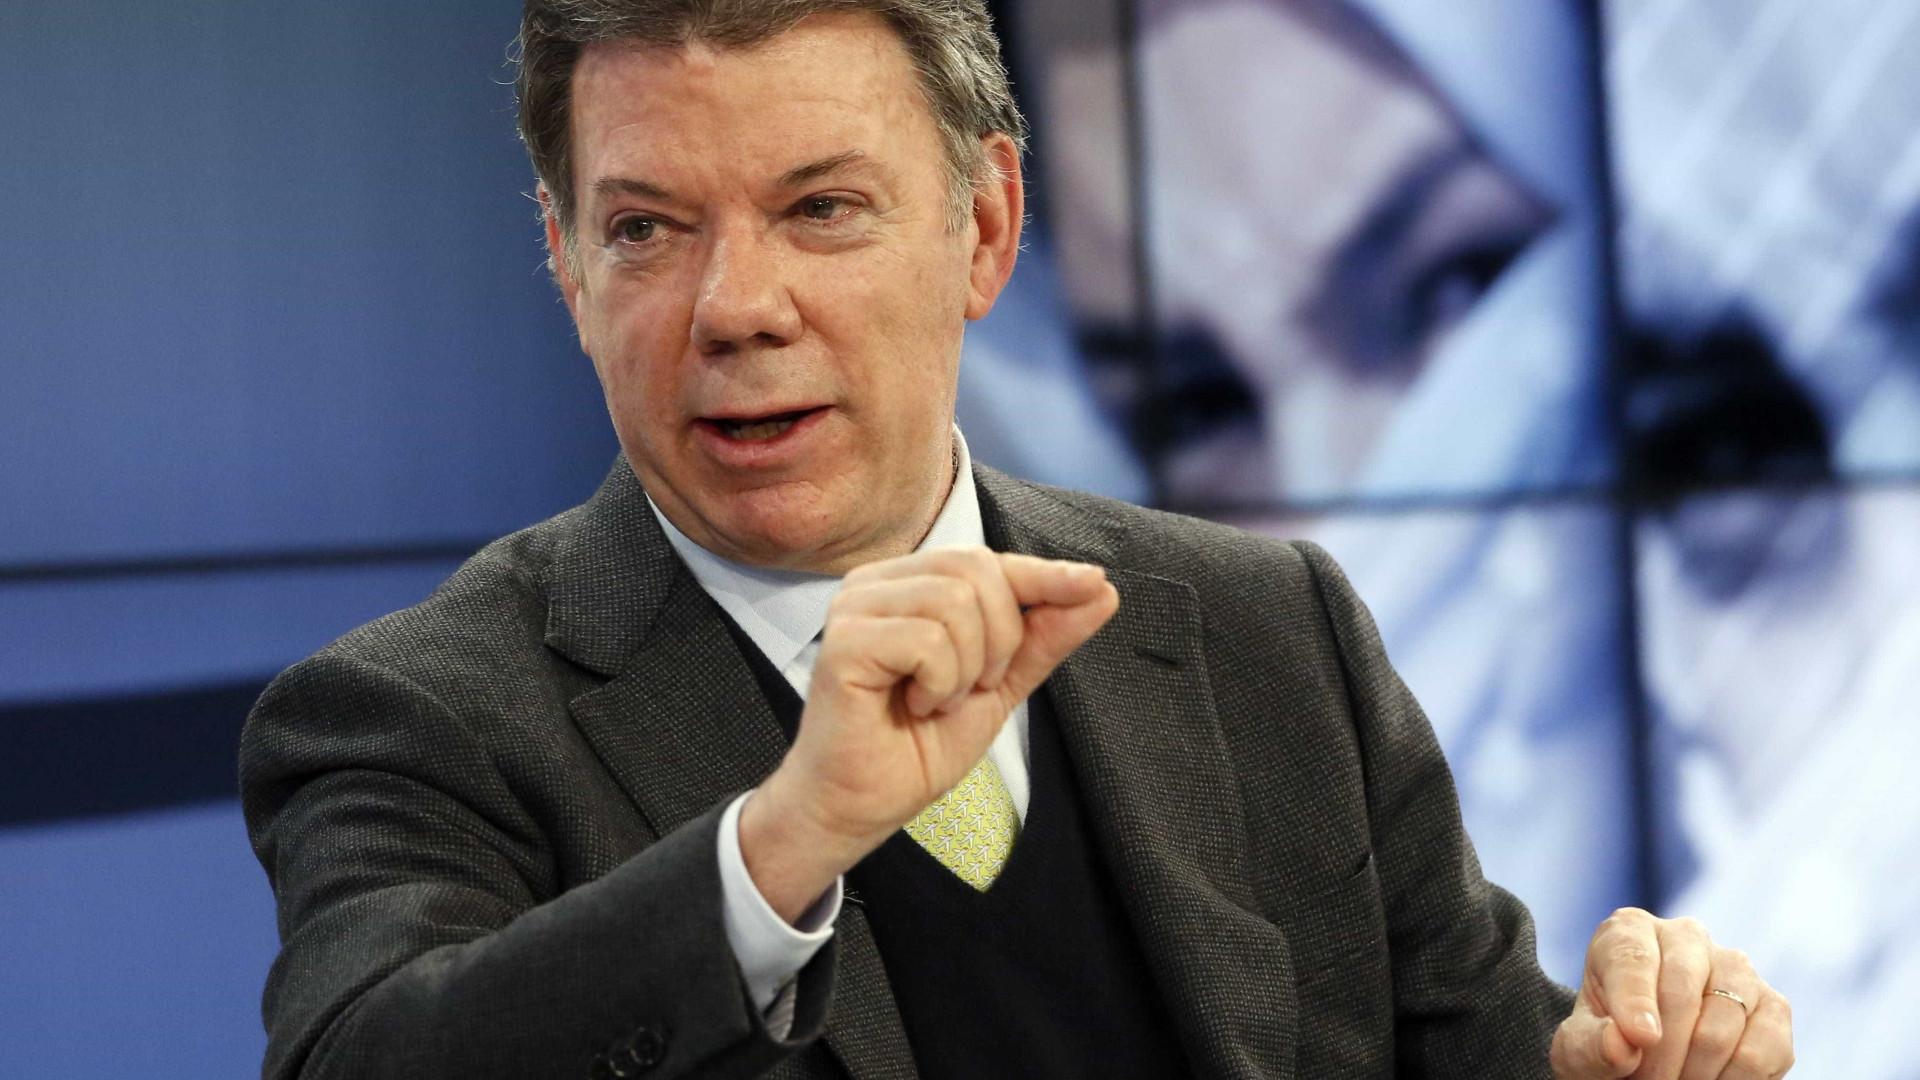 Presidente da Colômbia cancela visita a Portugal